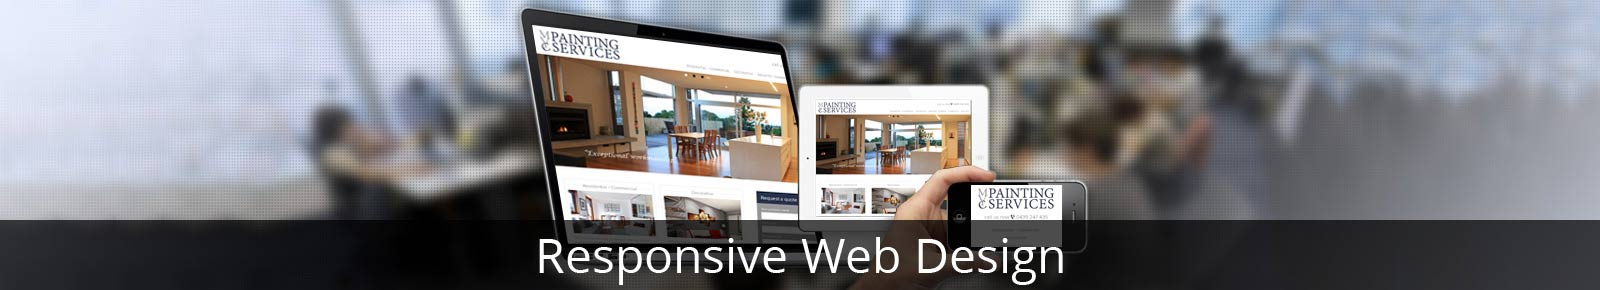 Responsive Web Design Sydney